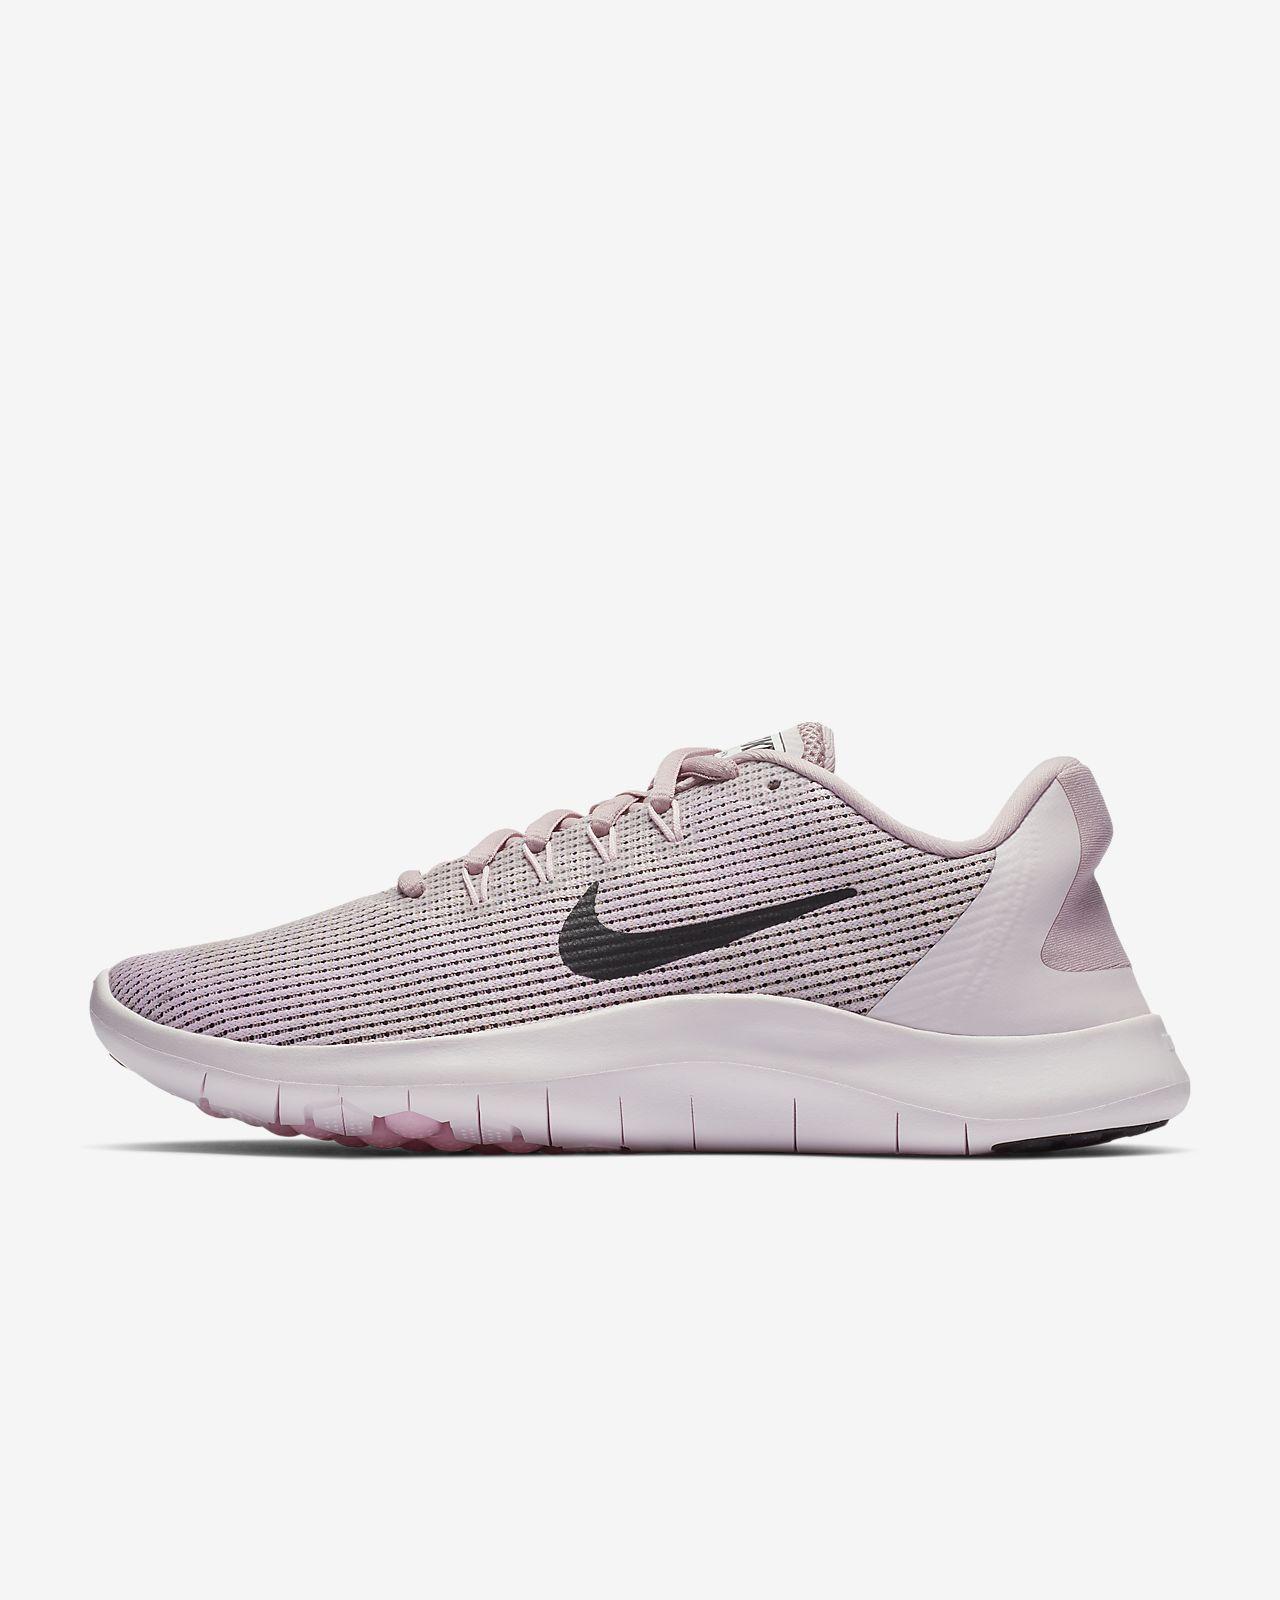 061f746f0a6c Nike Flex RN 2018 Women s Running Shoe. Nike.com